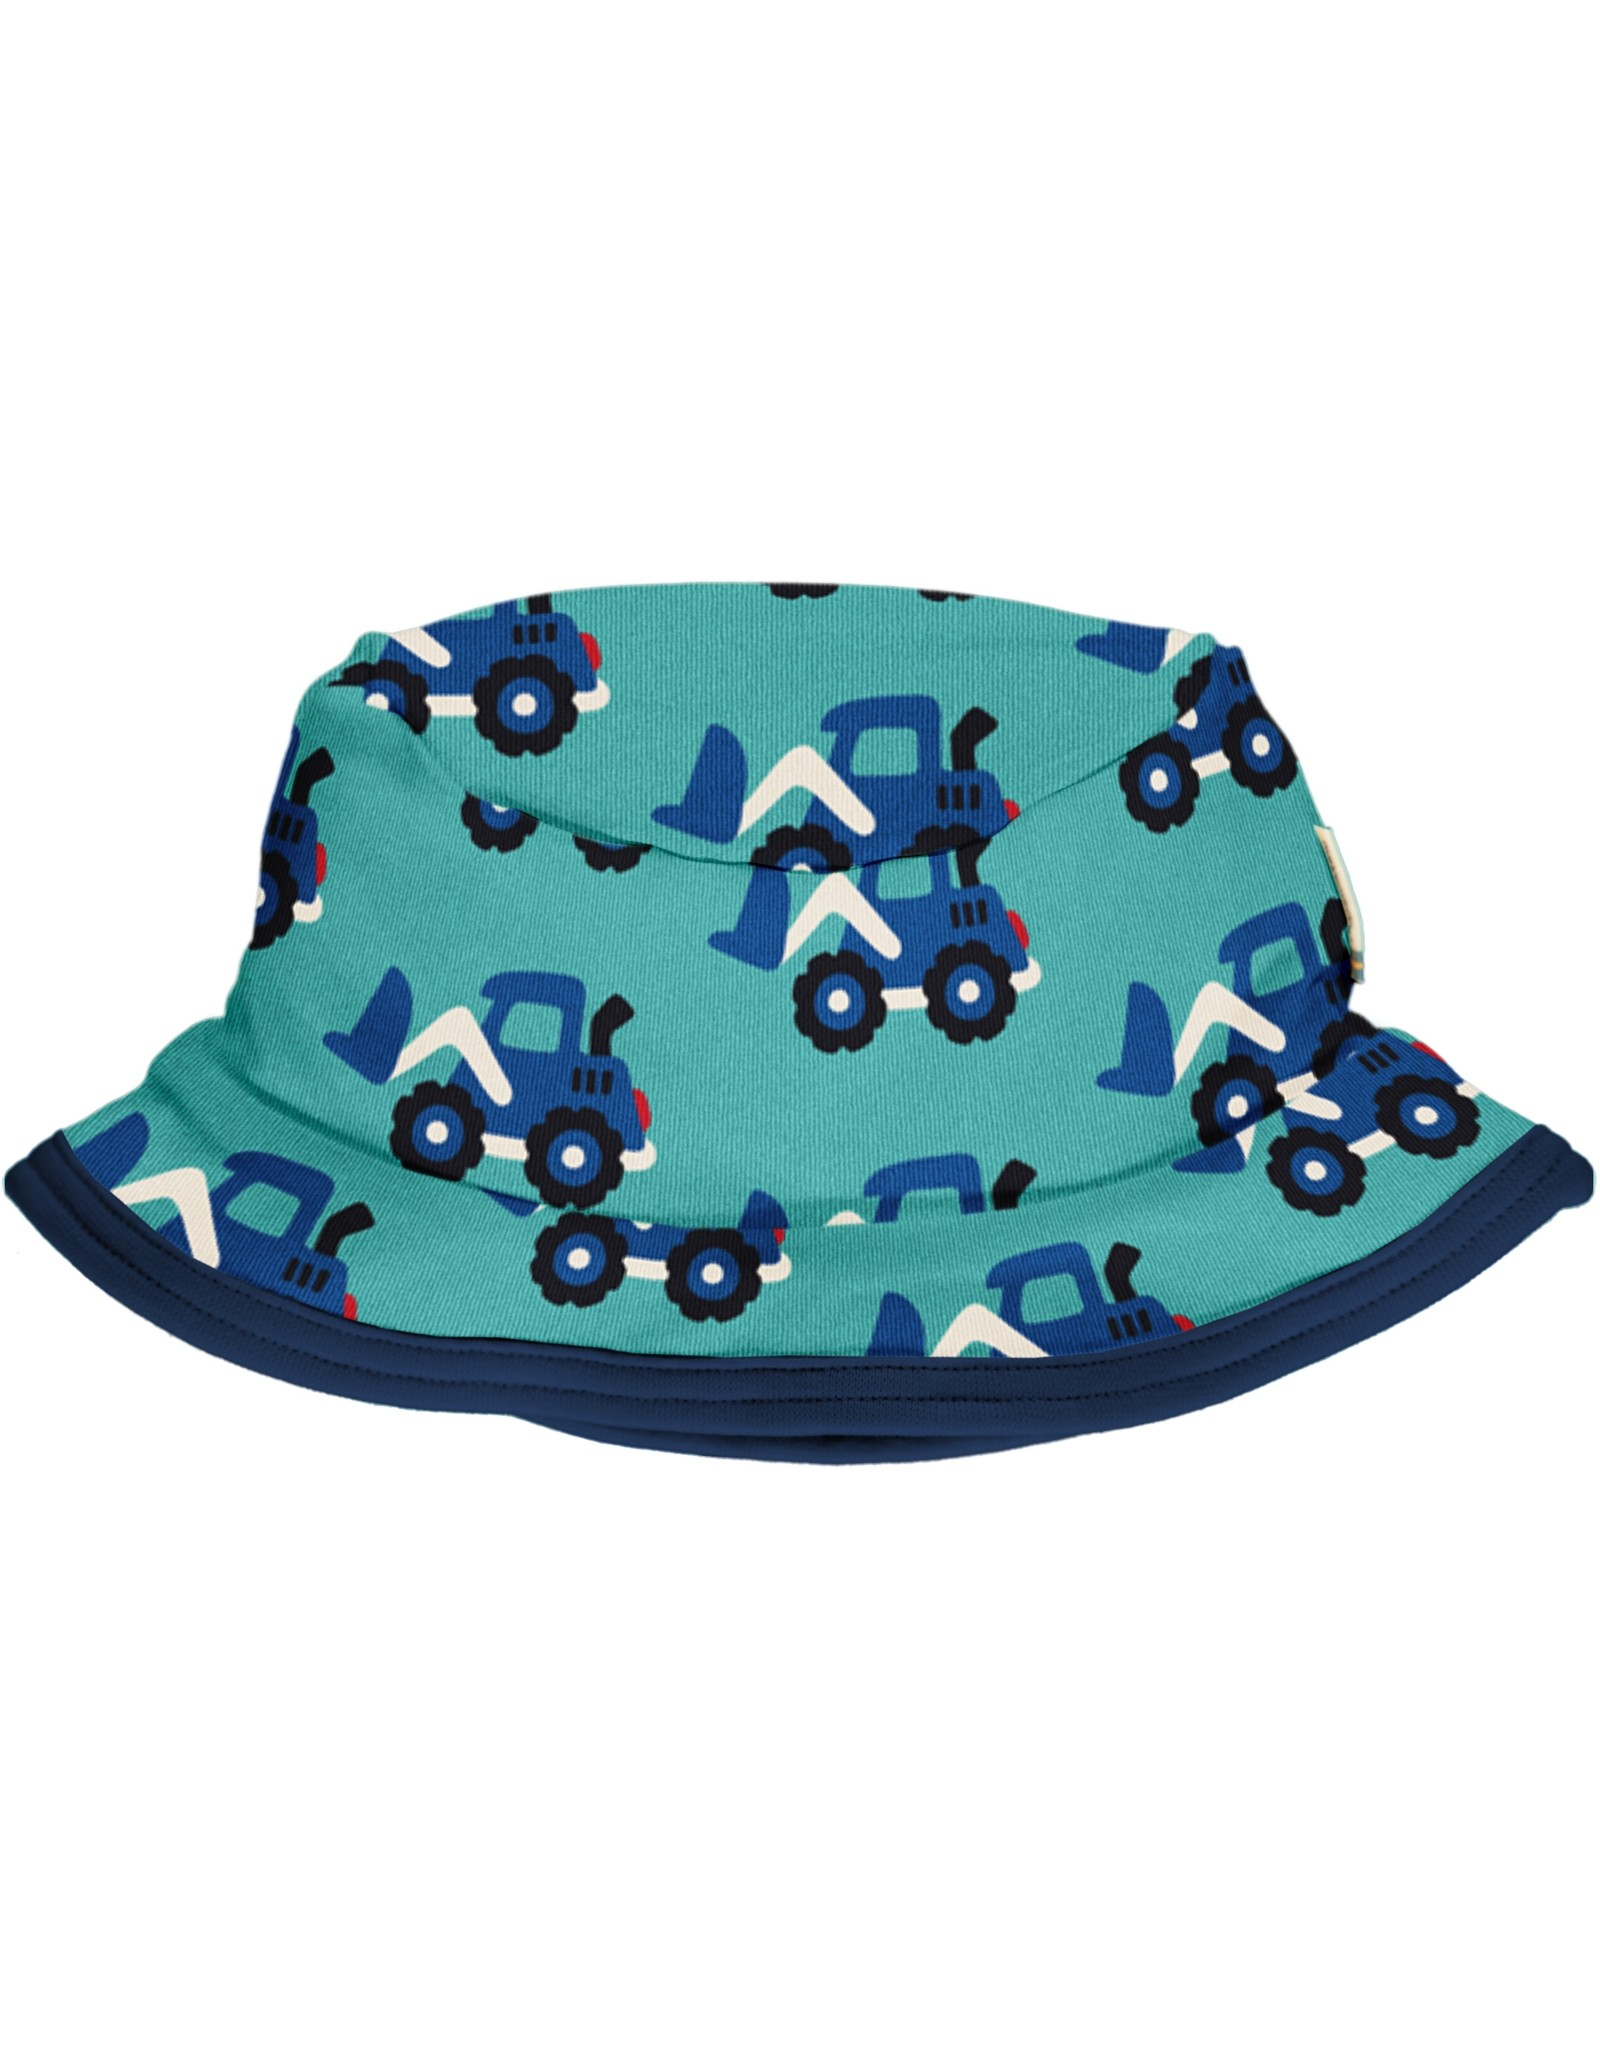 Maxomorra Maxomorra Sun Hat Loader